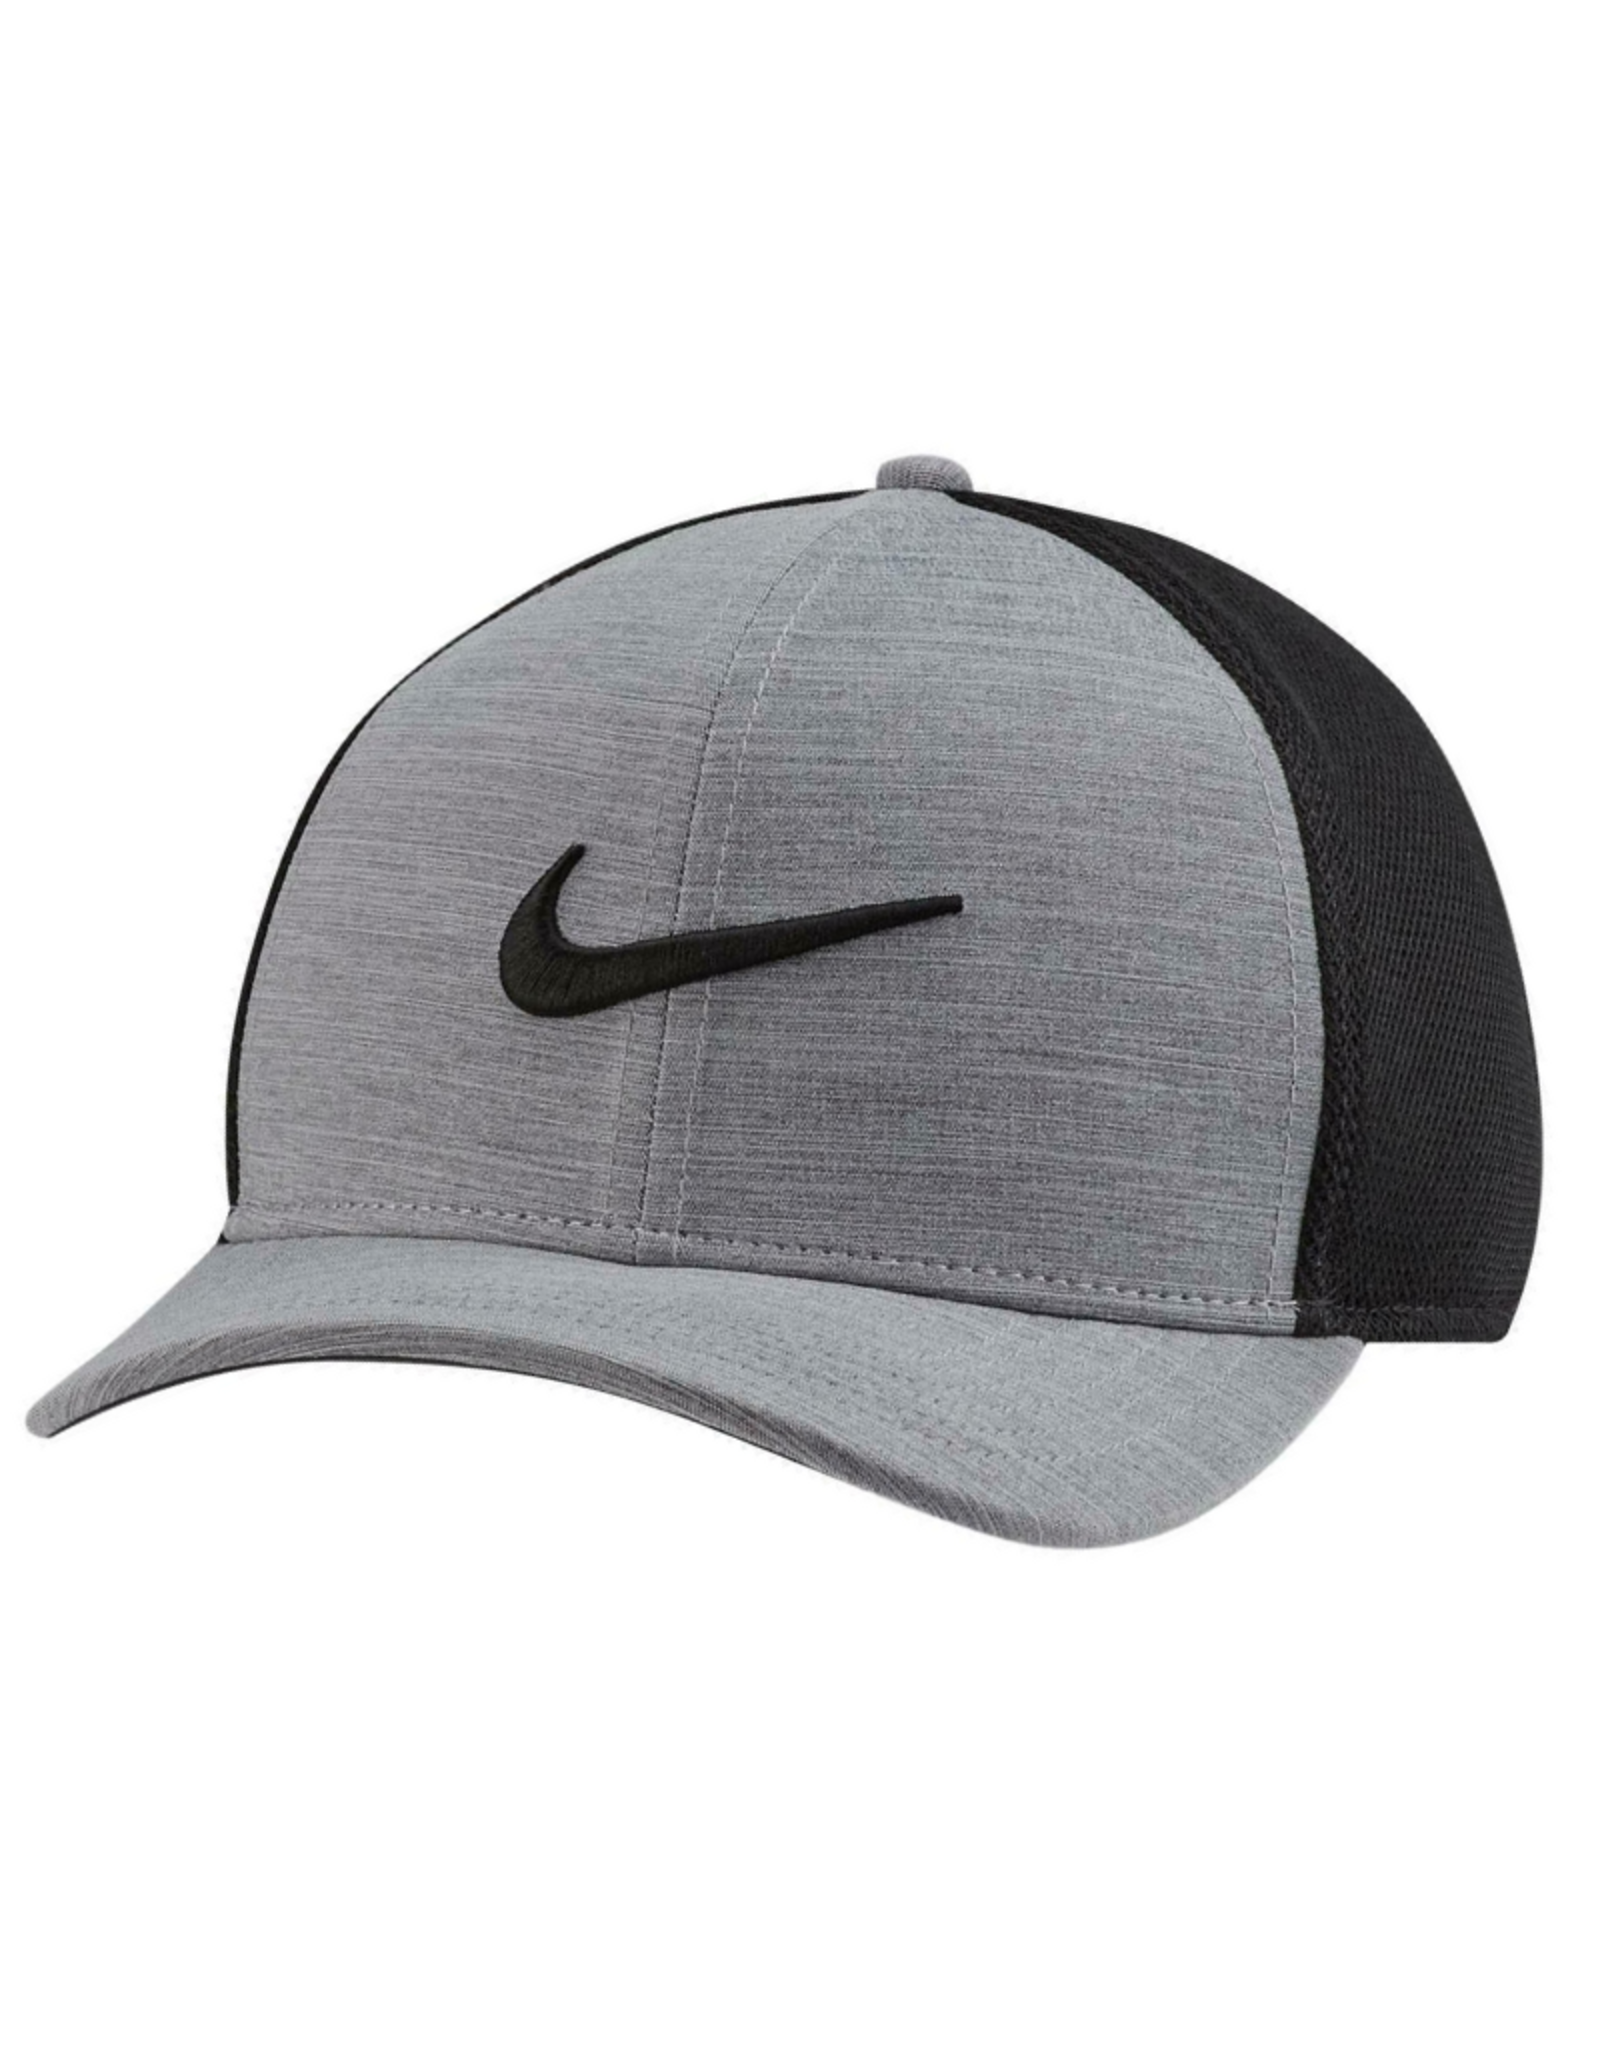 Nike Men's Aerobill Classic 99 Mesh Cap adjustable Grey Black